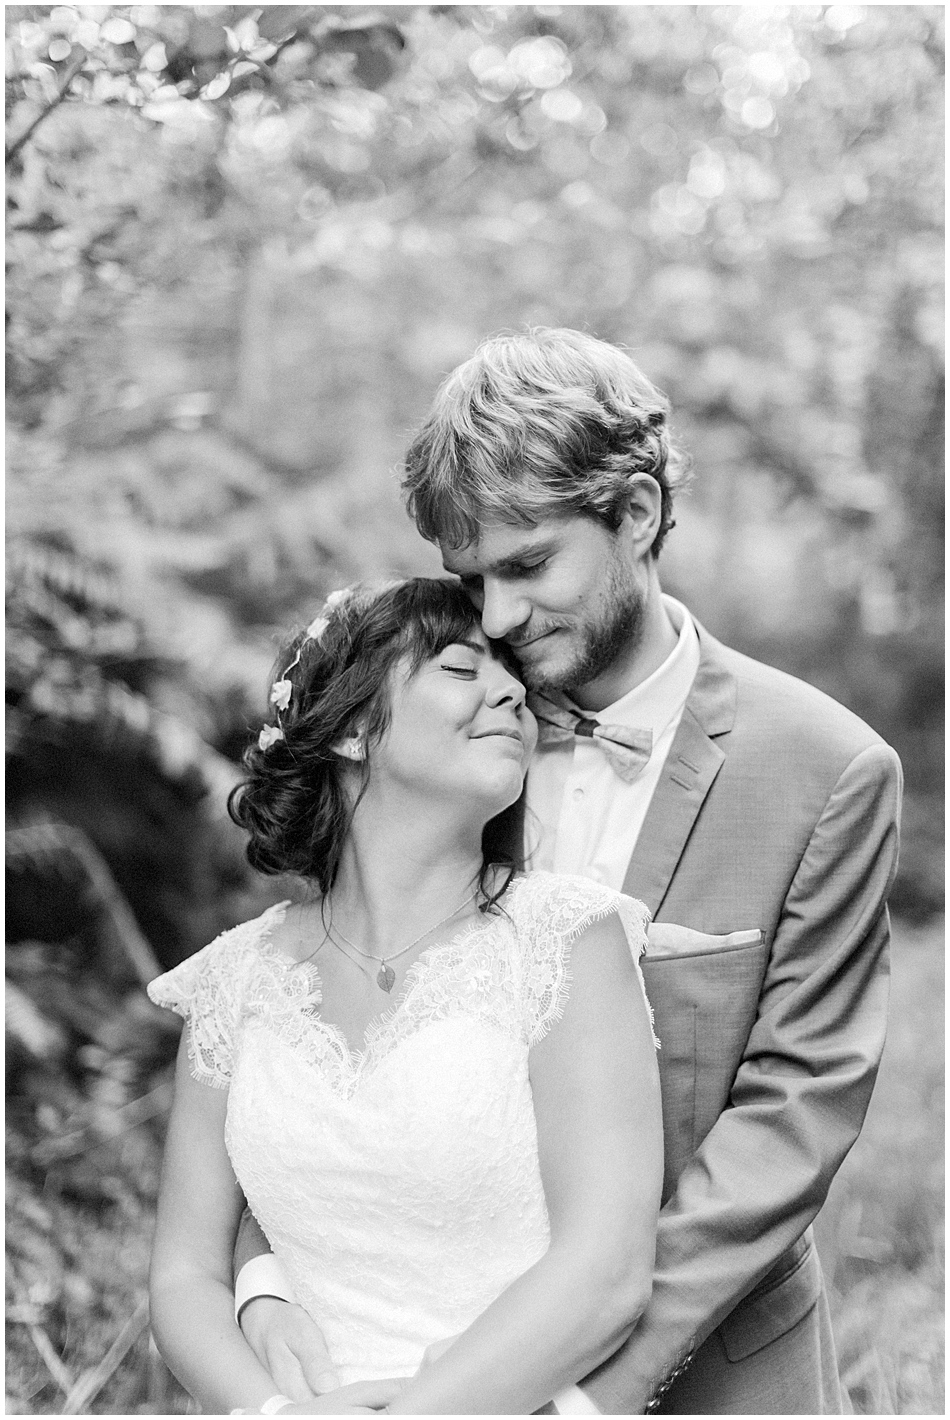 Marie-Alice G-Photographe Mariage France Normandie - Photographe Mariage Manche valognes cherbourg - Wedding Photographer France_0165